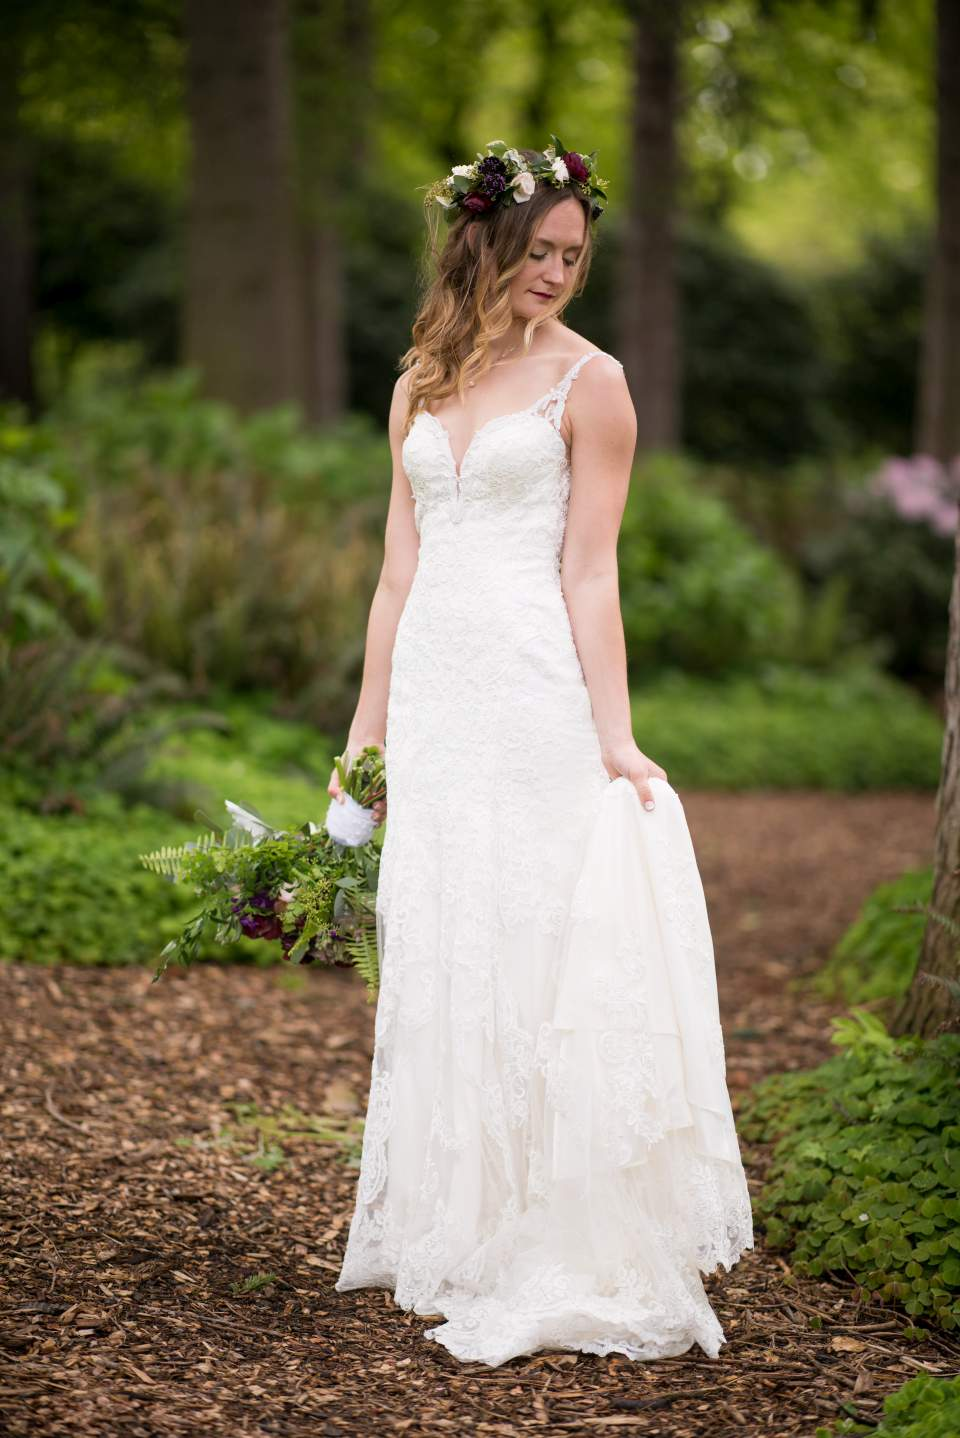 beautiful boho chic bride on wedding day